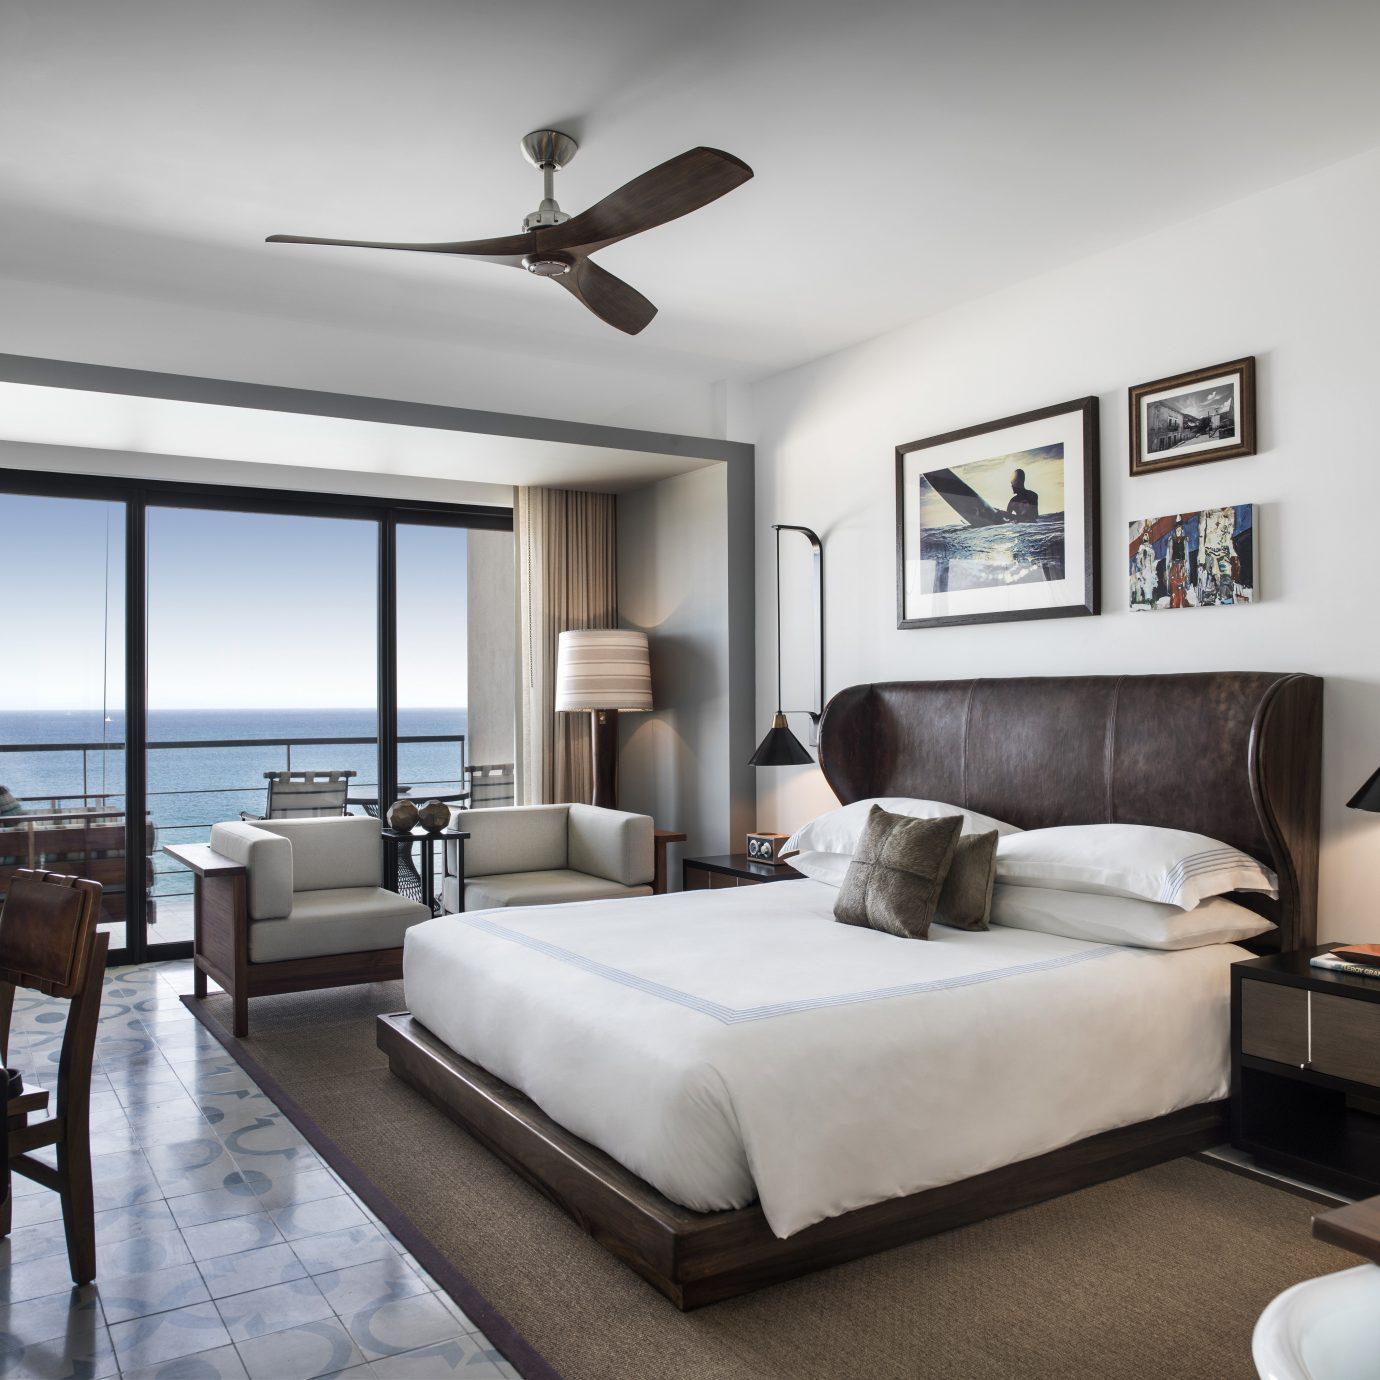 Balcony Bedroom Hip Hotels Modern Scenic views Suite Trip Ideas Tropical Waterfront property living room home condominium Villa